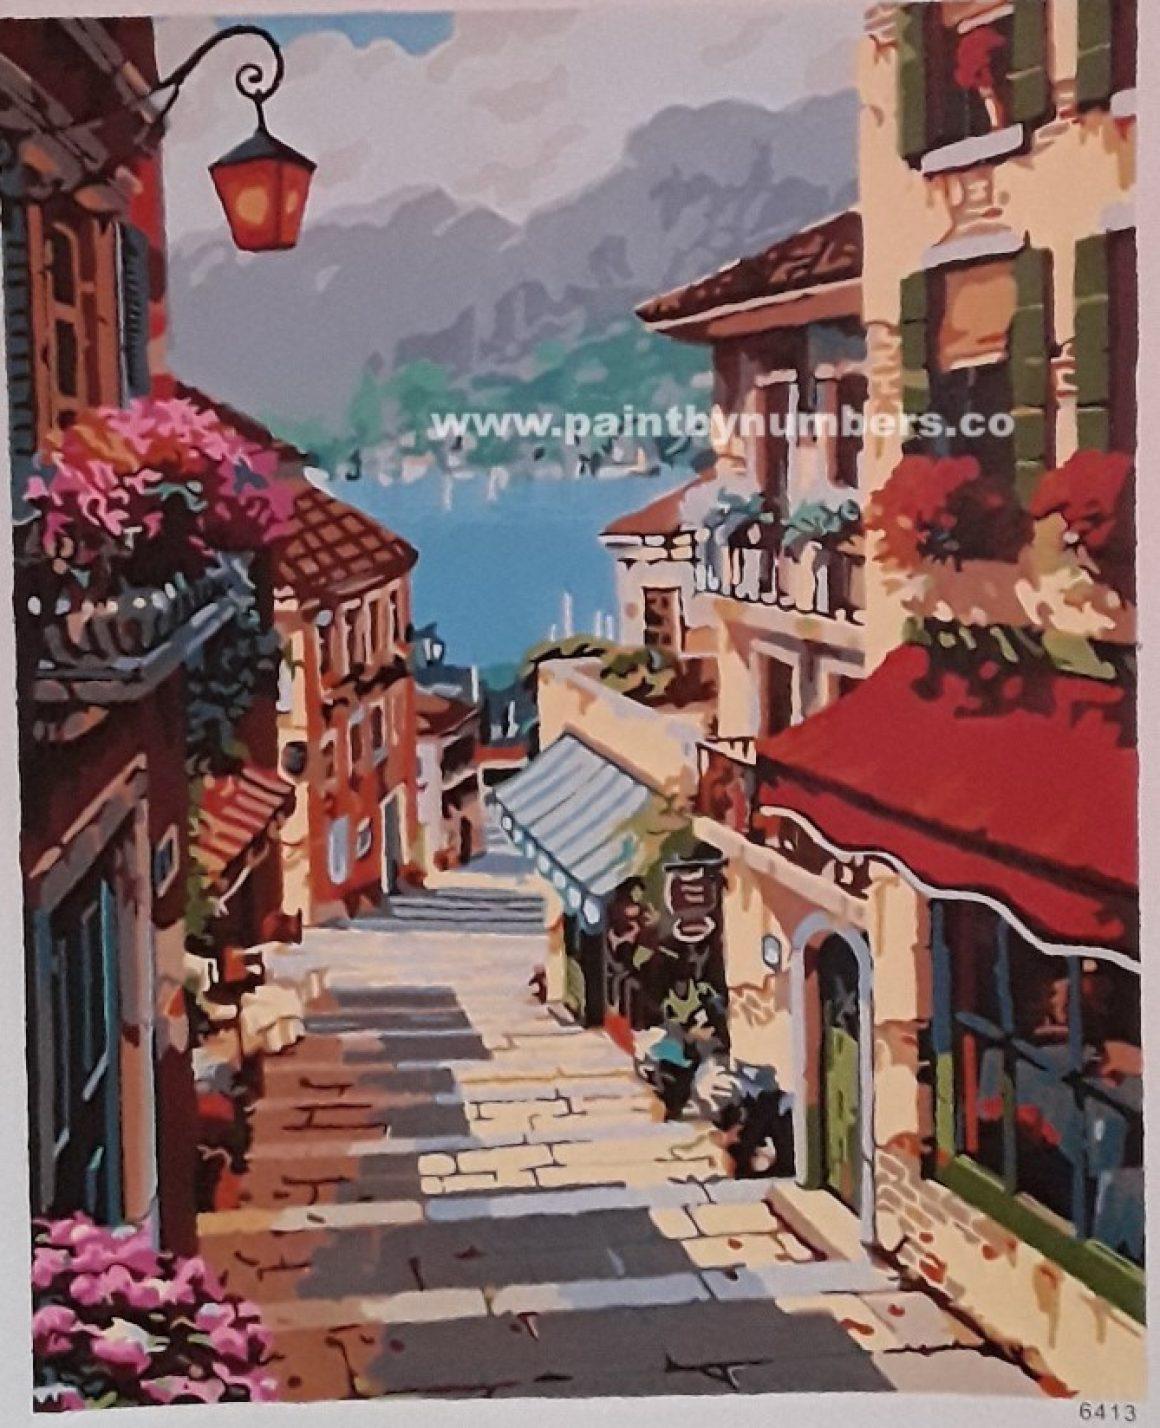 Serene village featuring a brick road4